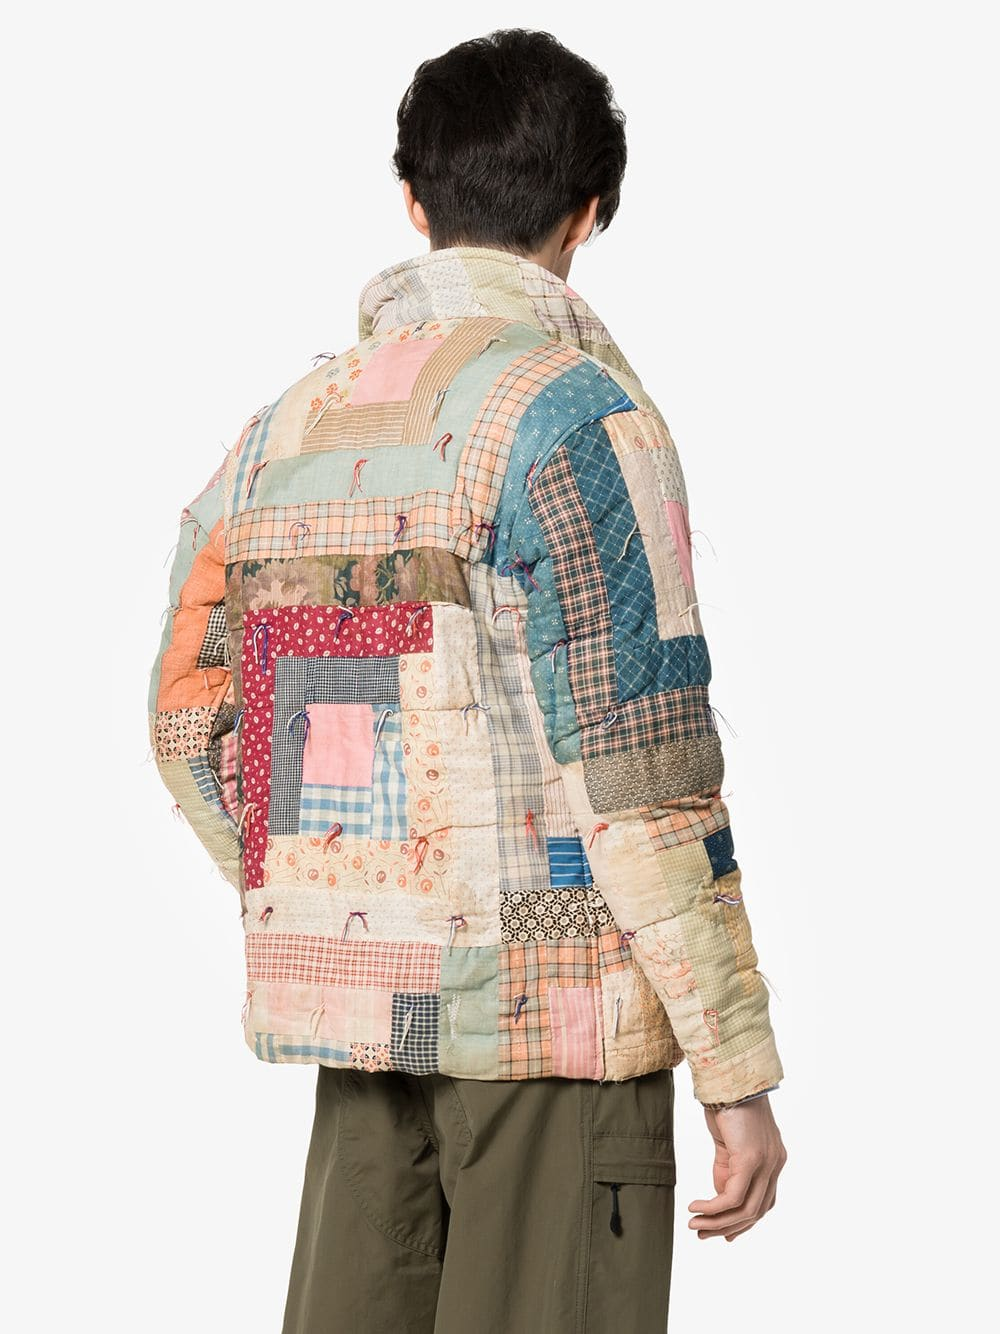 bode-patchwork-quilted-cotton-workwear-jacket_13429568_16291538_1000.jpg